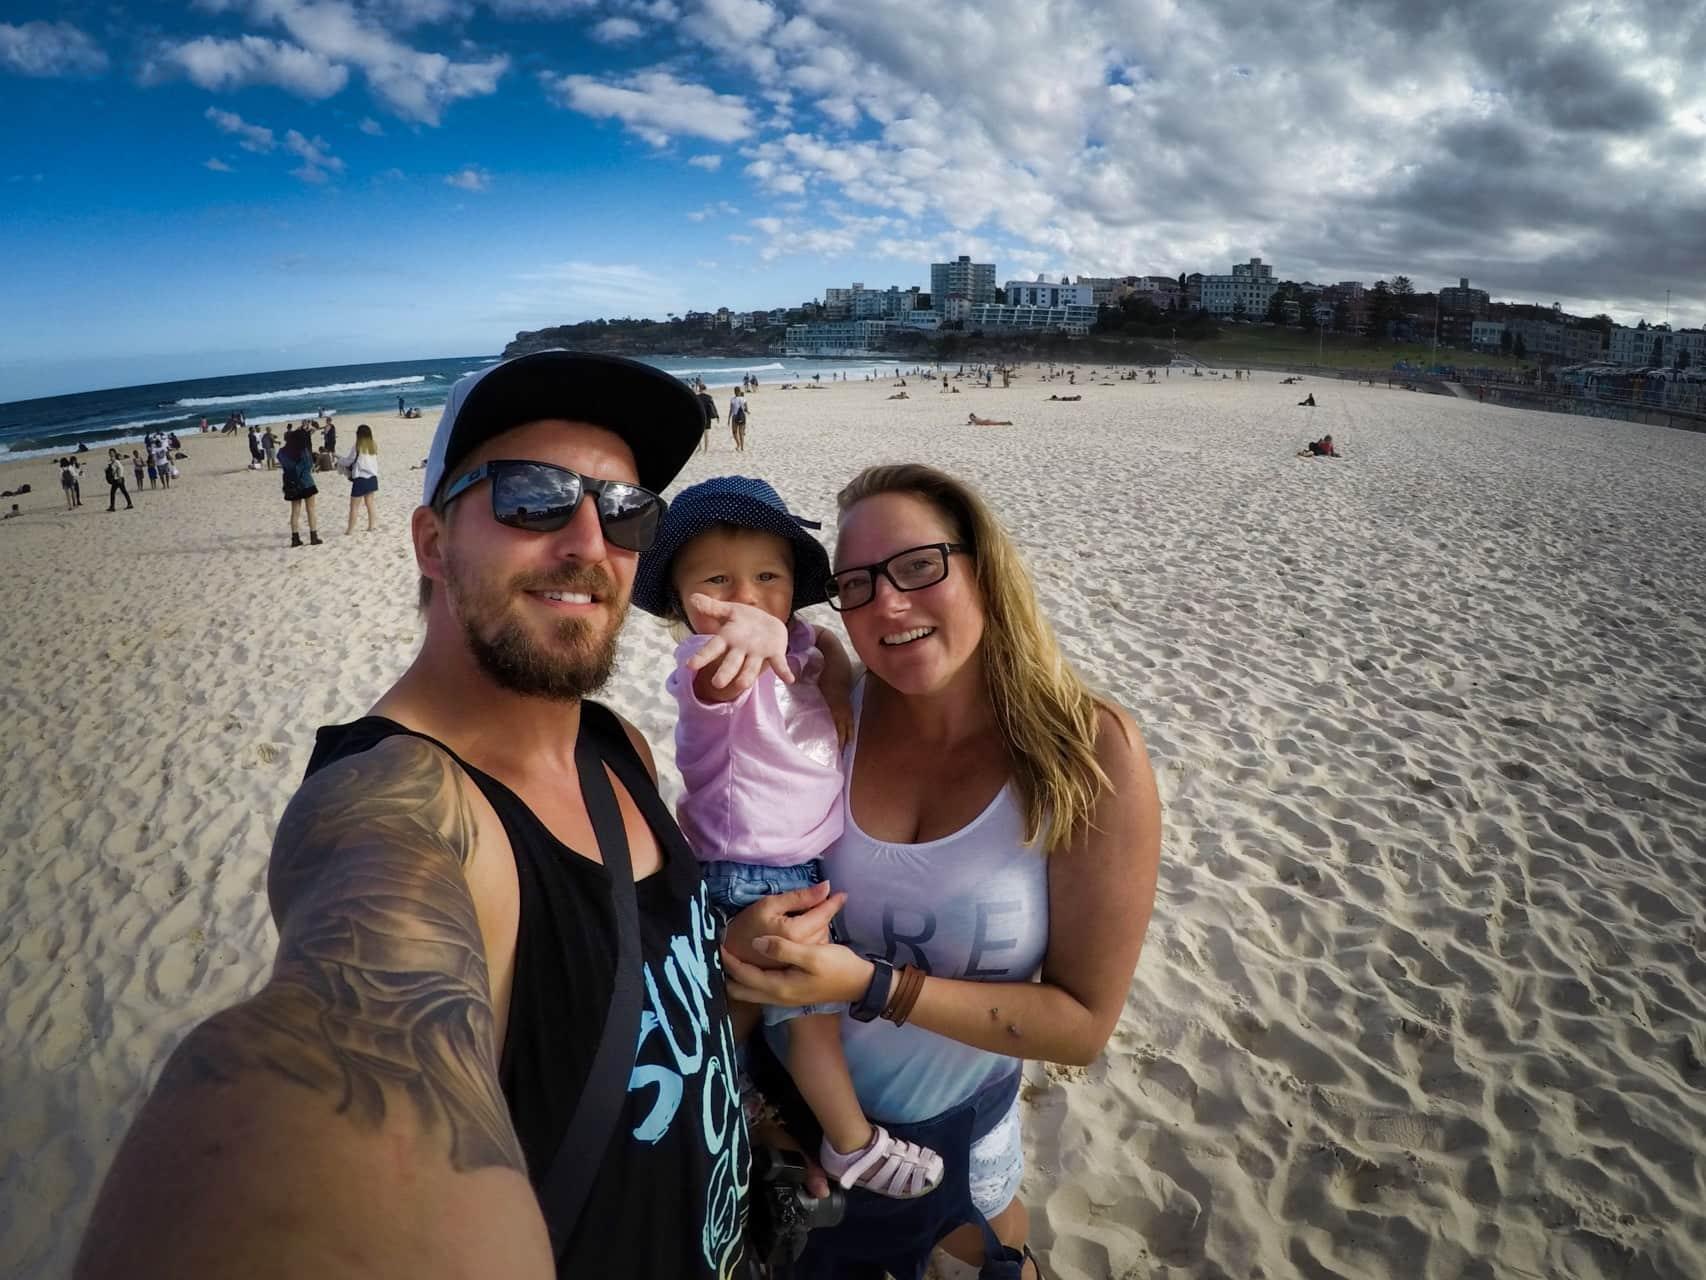 Selfie Bondi Beach Sydney Australia 2018 gorpro hero5